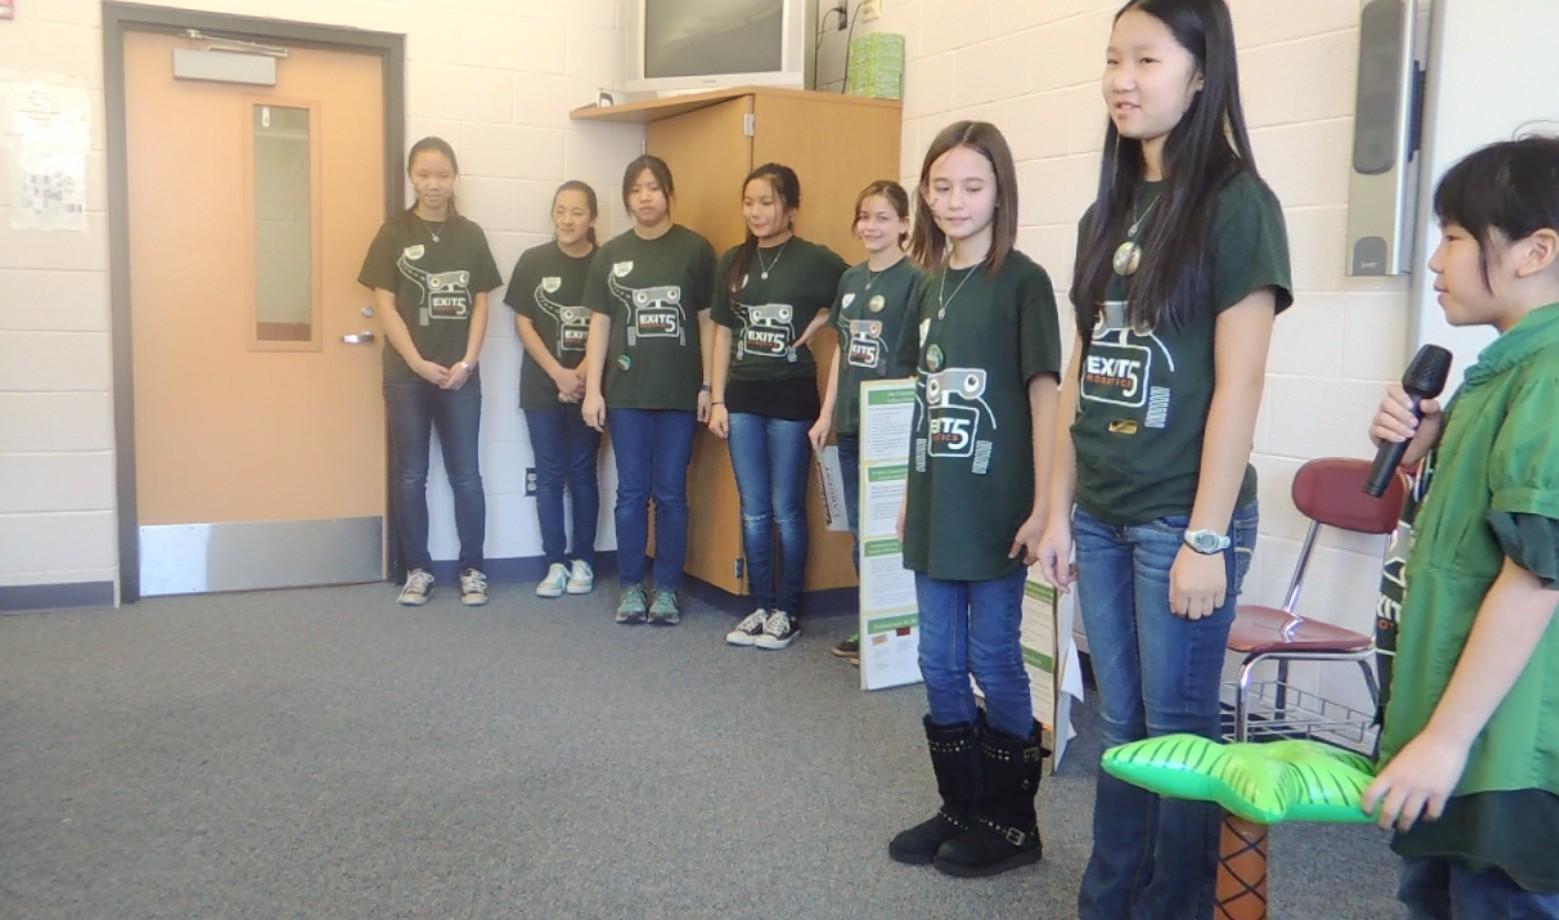 Livingston's Exit 5 Robotics Wins Third Consecutive NJ State FLL Champion's Award